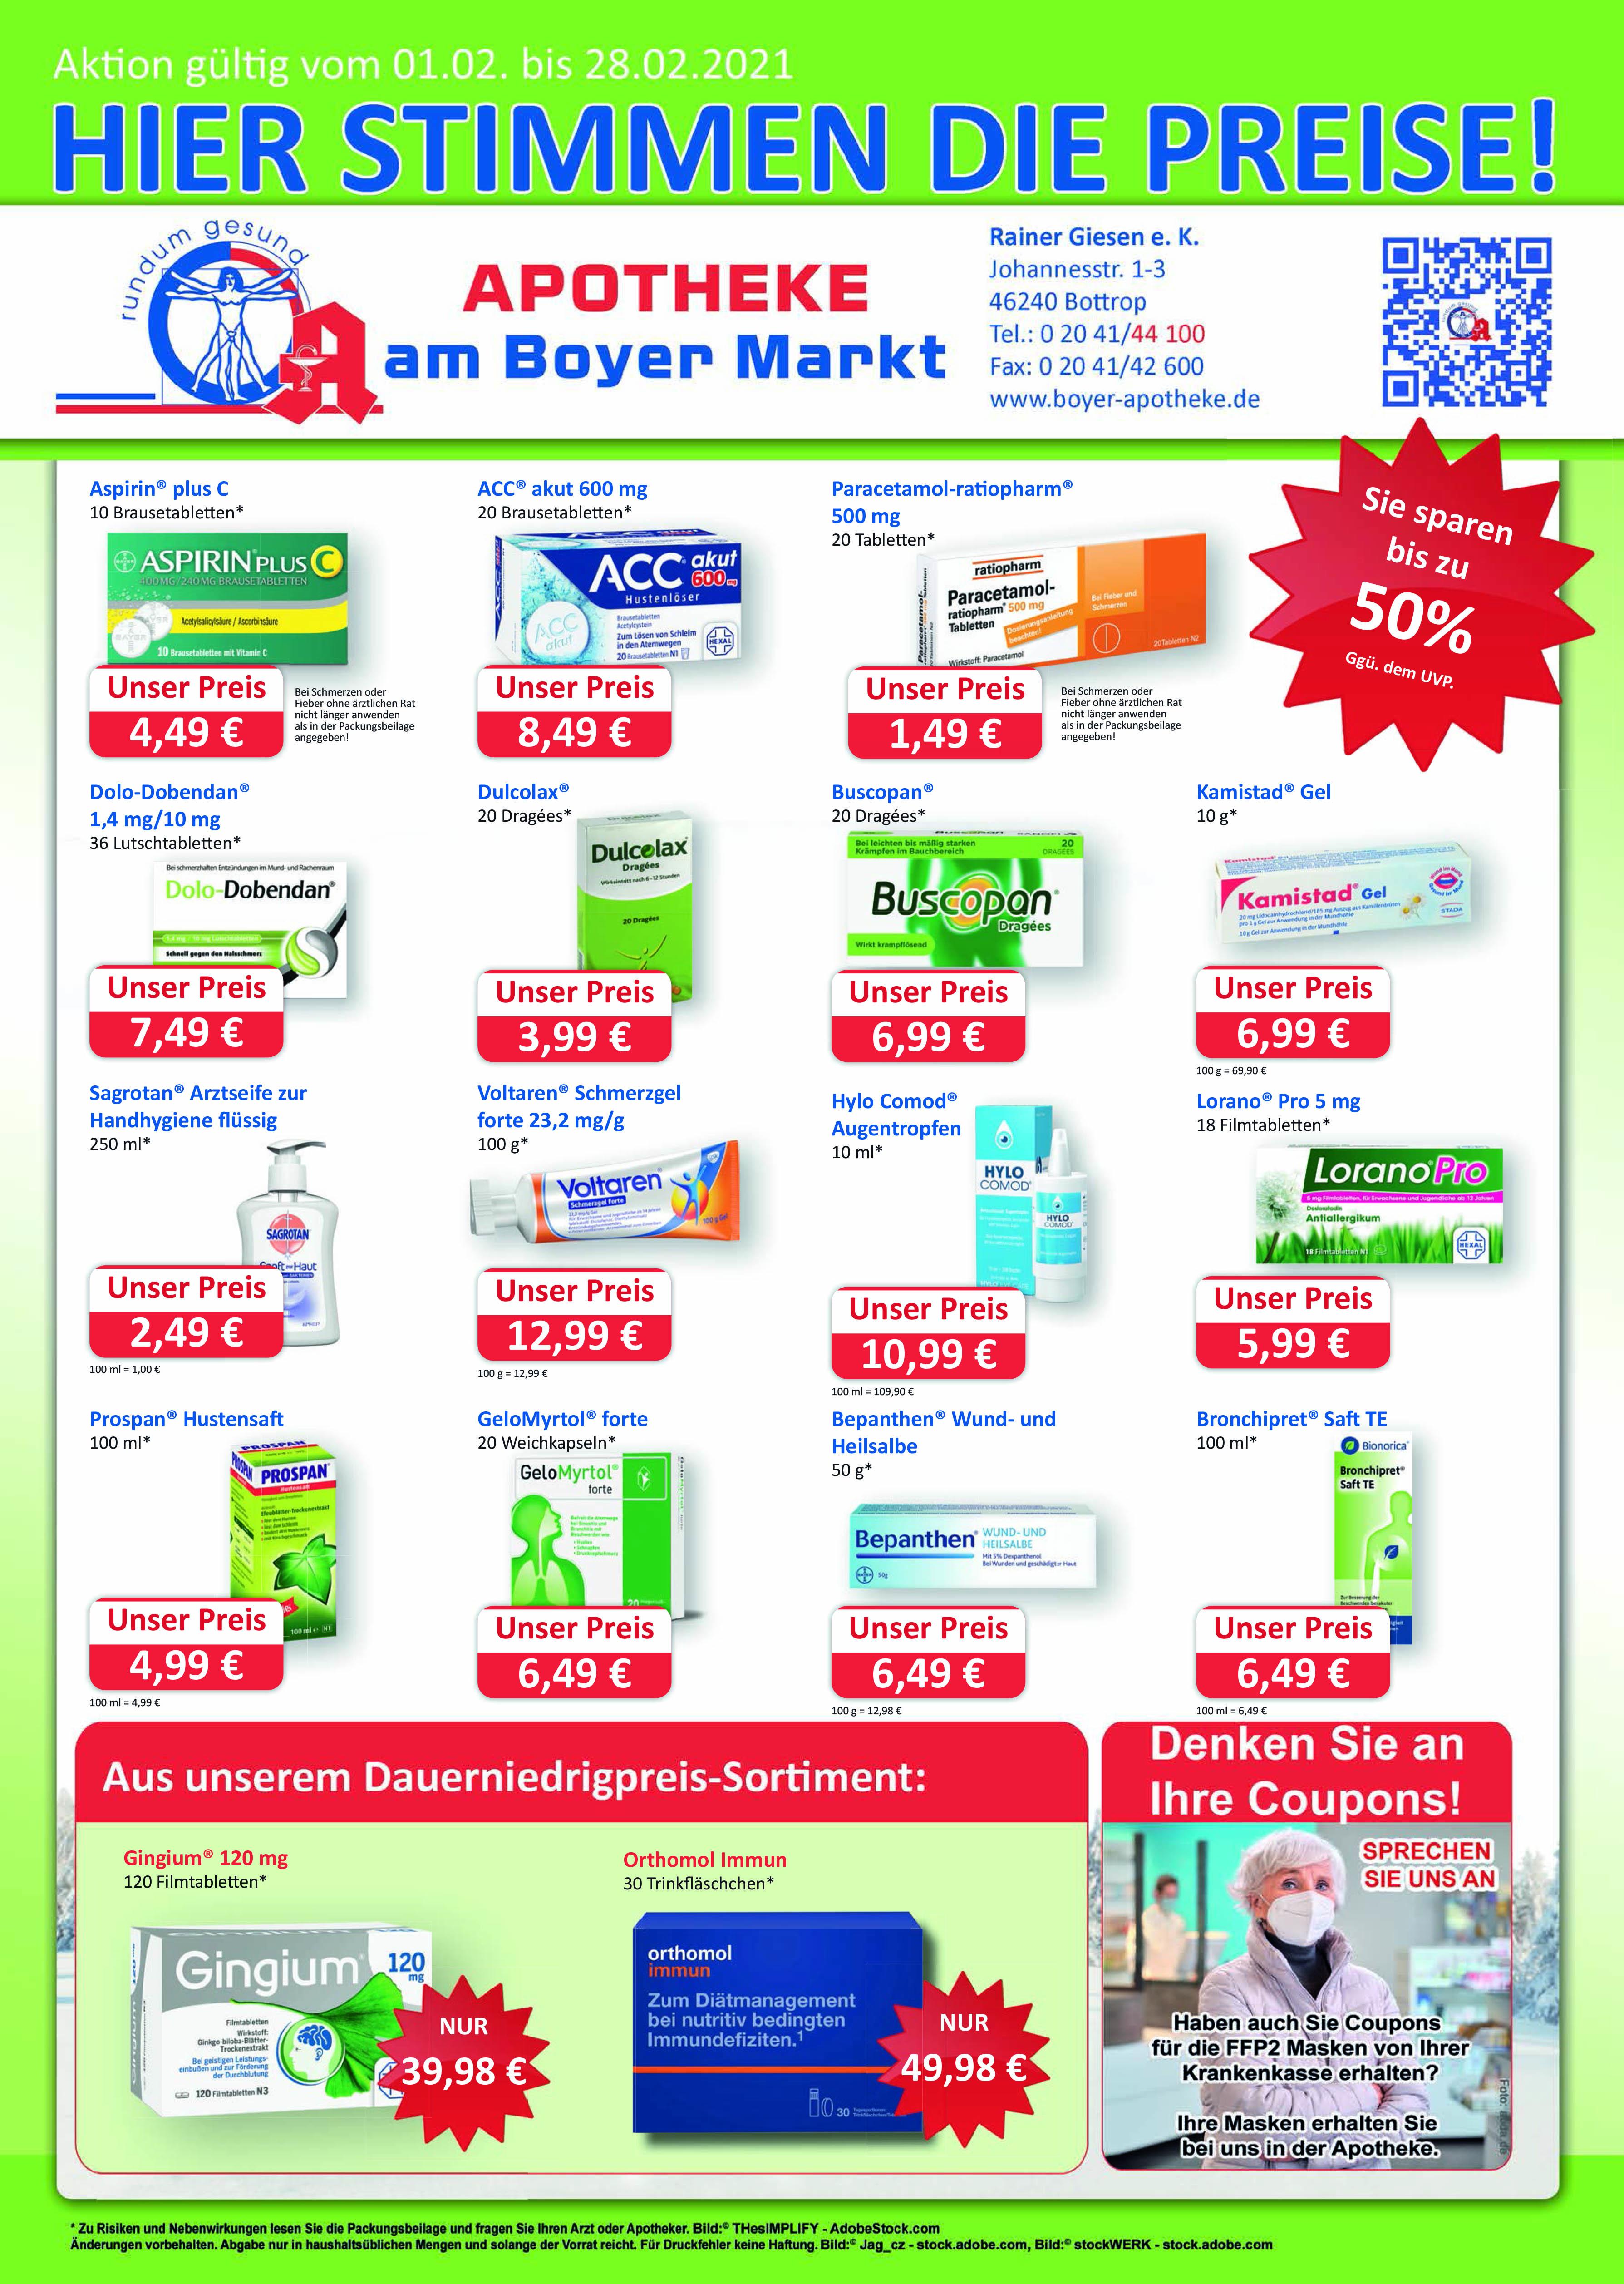 http://www.apotheken.de/fileadmin/clubarea/00000-Angebote/46240_12086_am_boyer_markt_angebot_1.jpg